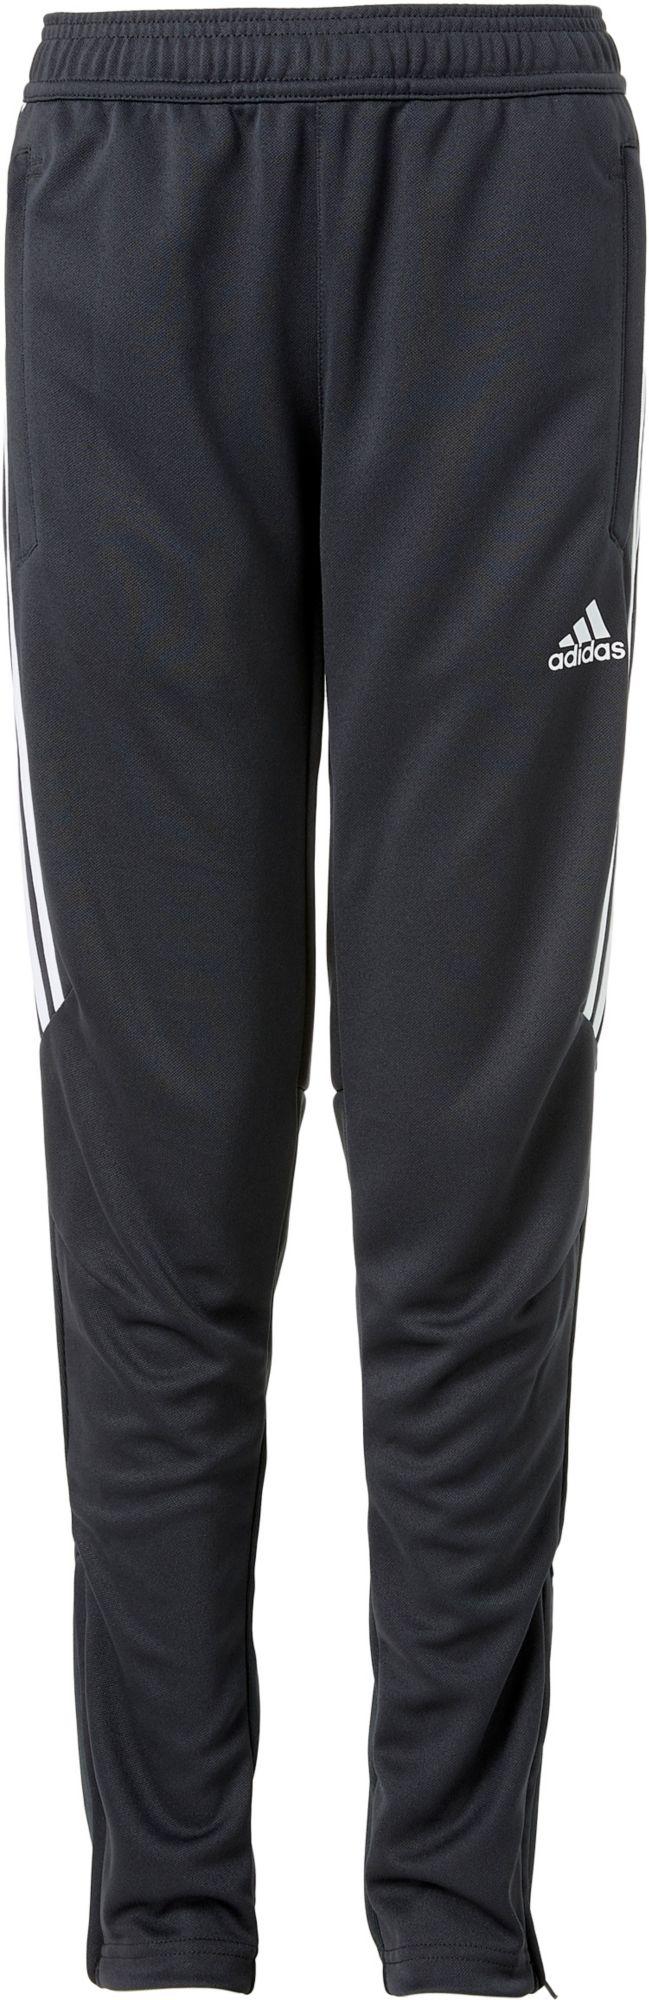 adidas training pants tiro17